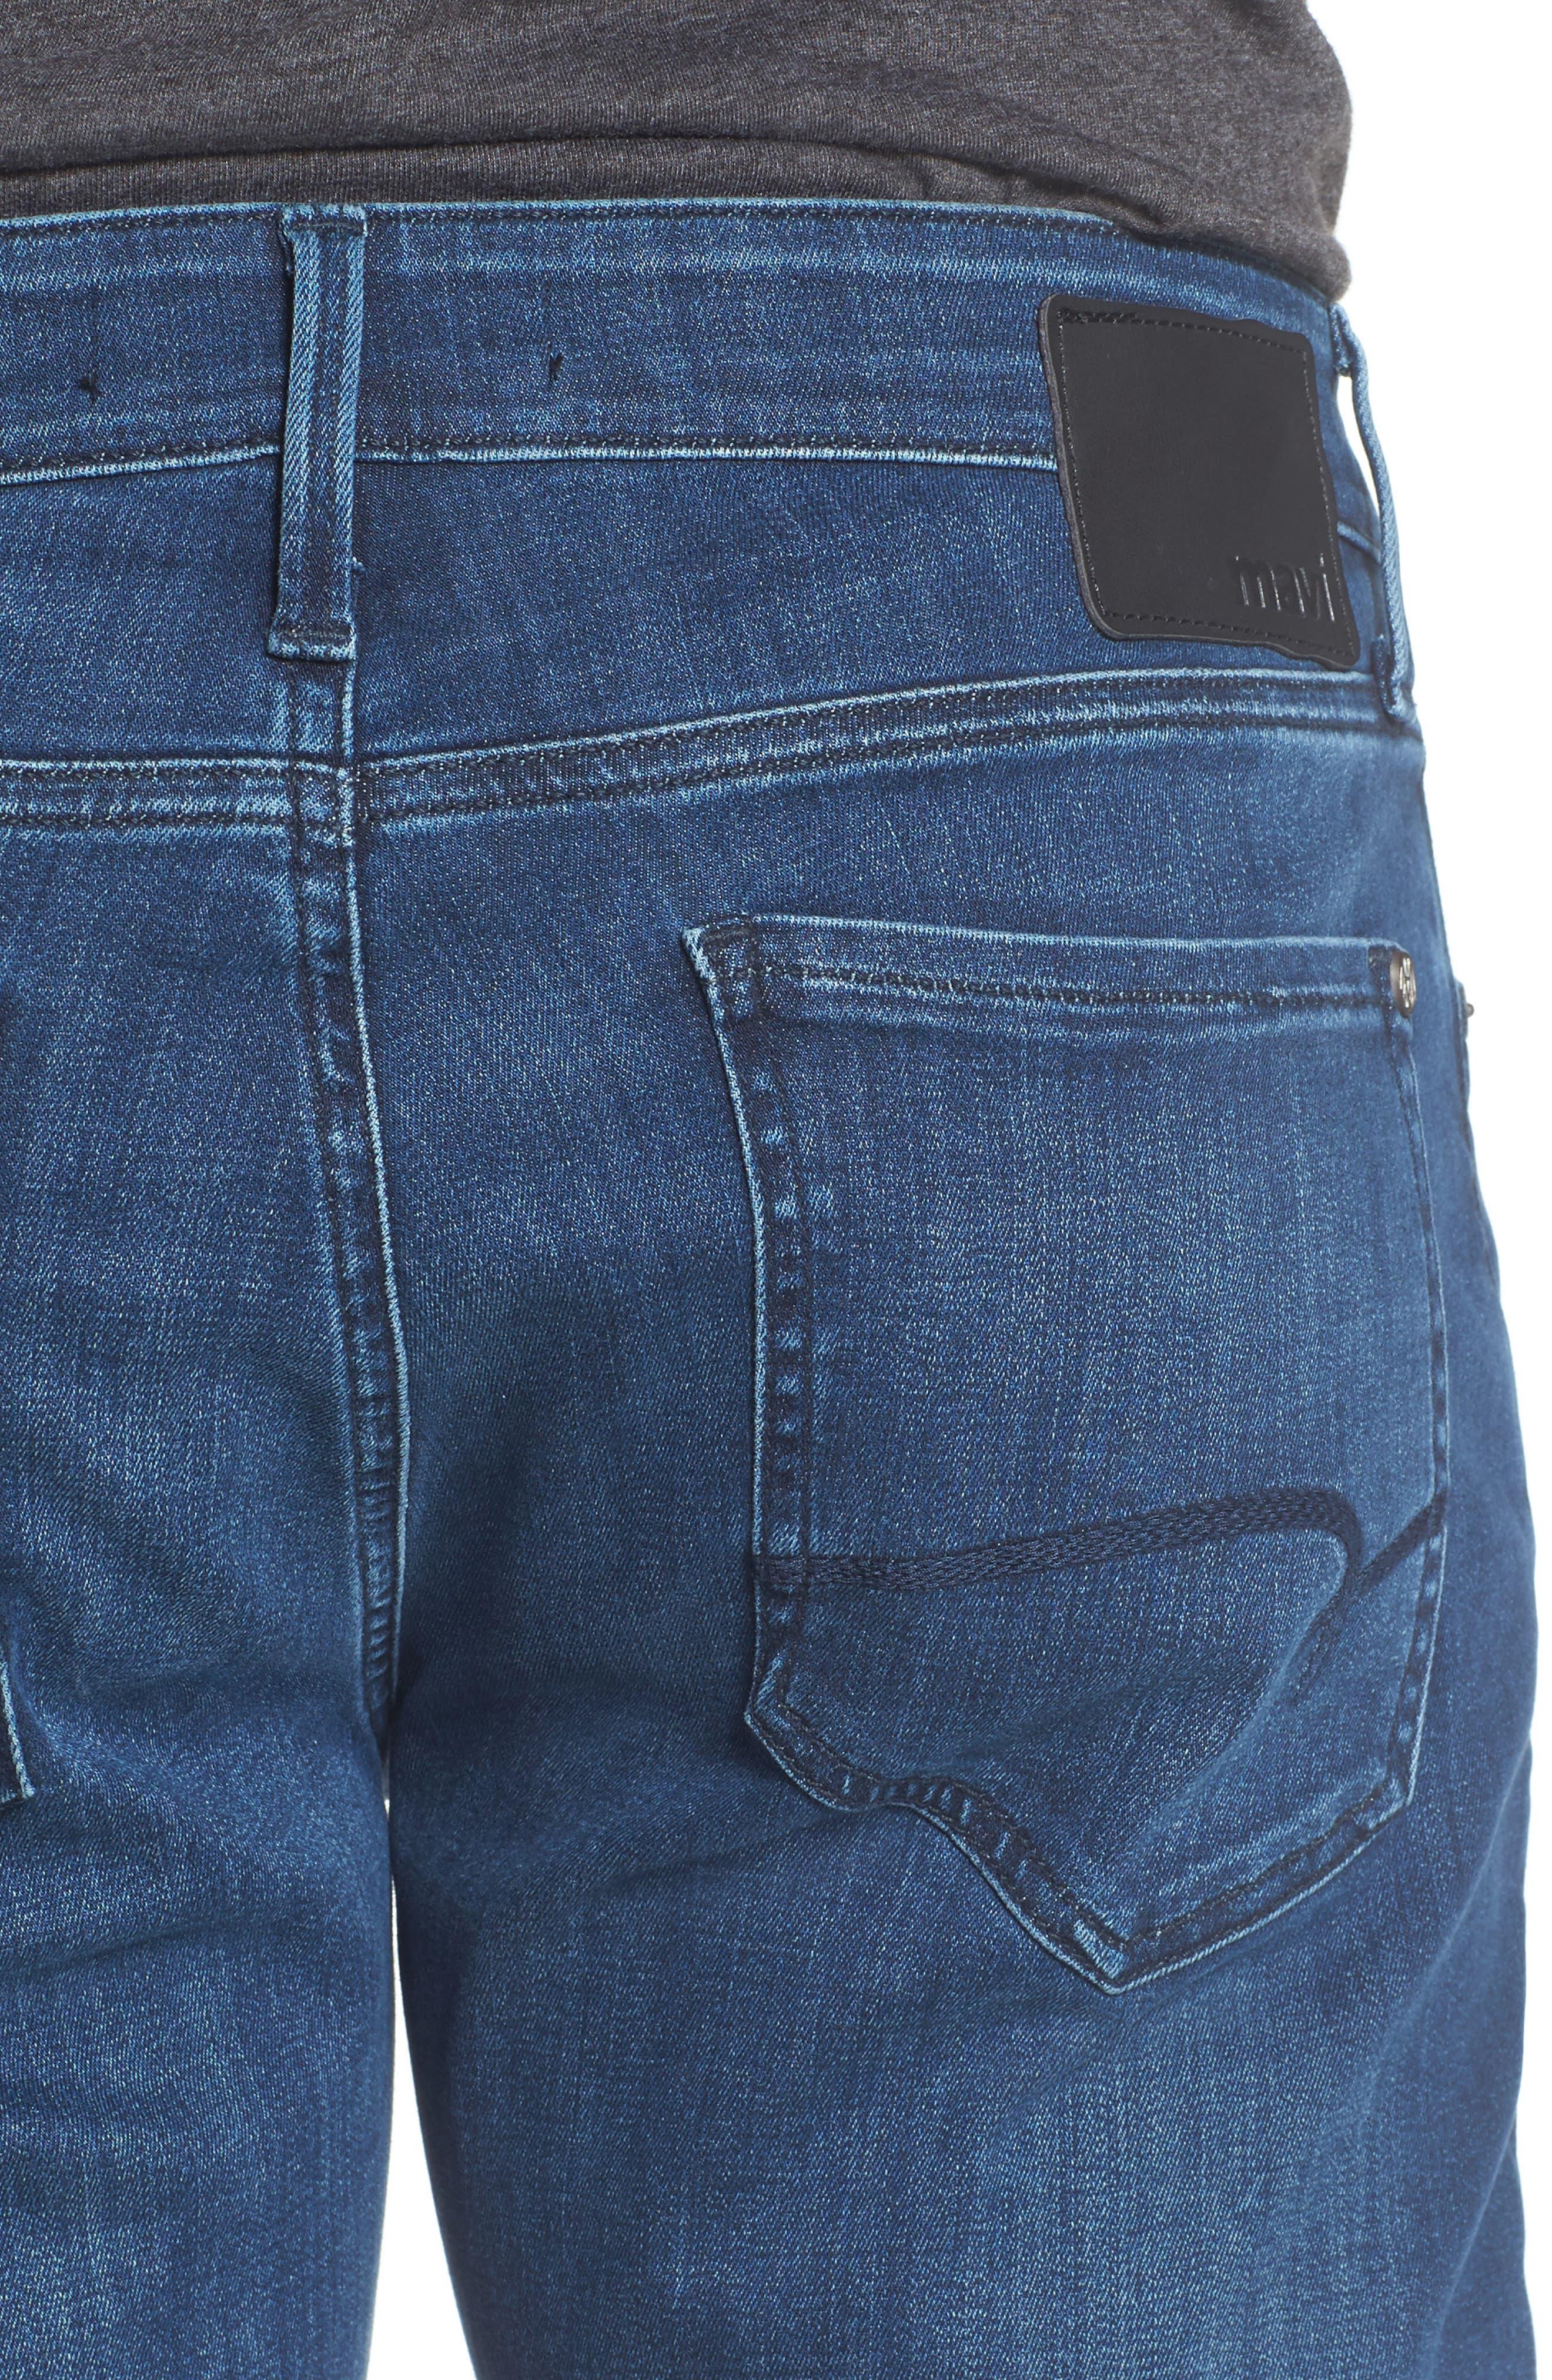 Zach Straight Leg Jeans,                             Alternate thumbnail 4, color,